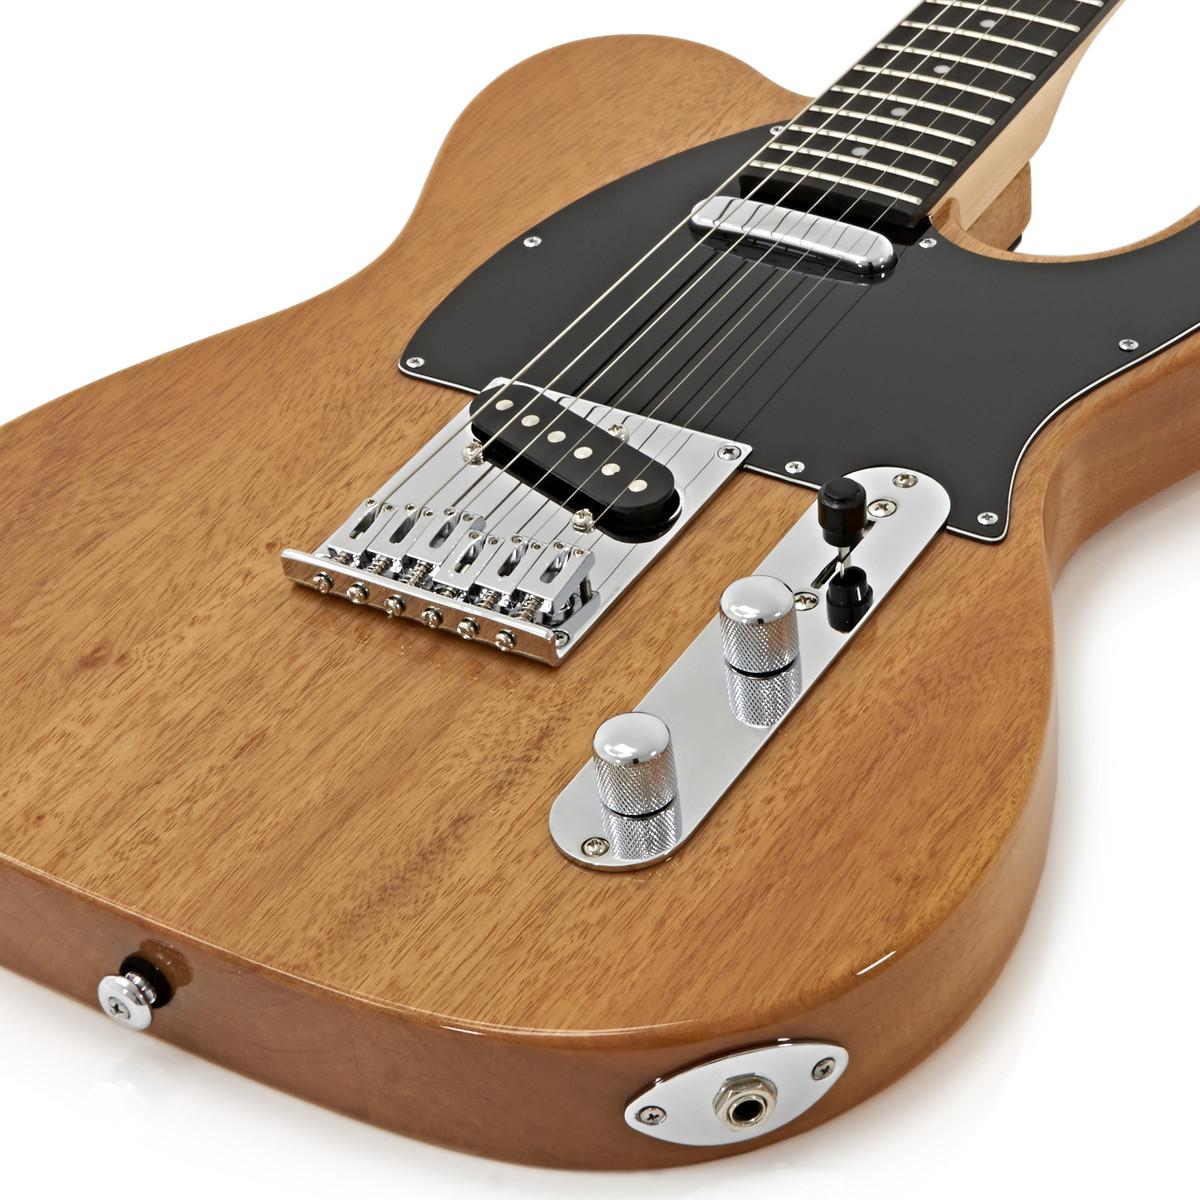 Greg Bennett Electric Guitars : greg bennett formula fa 1 electric guitar natural at ~ Vivirlamusica.com Haus und Dekorationen